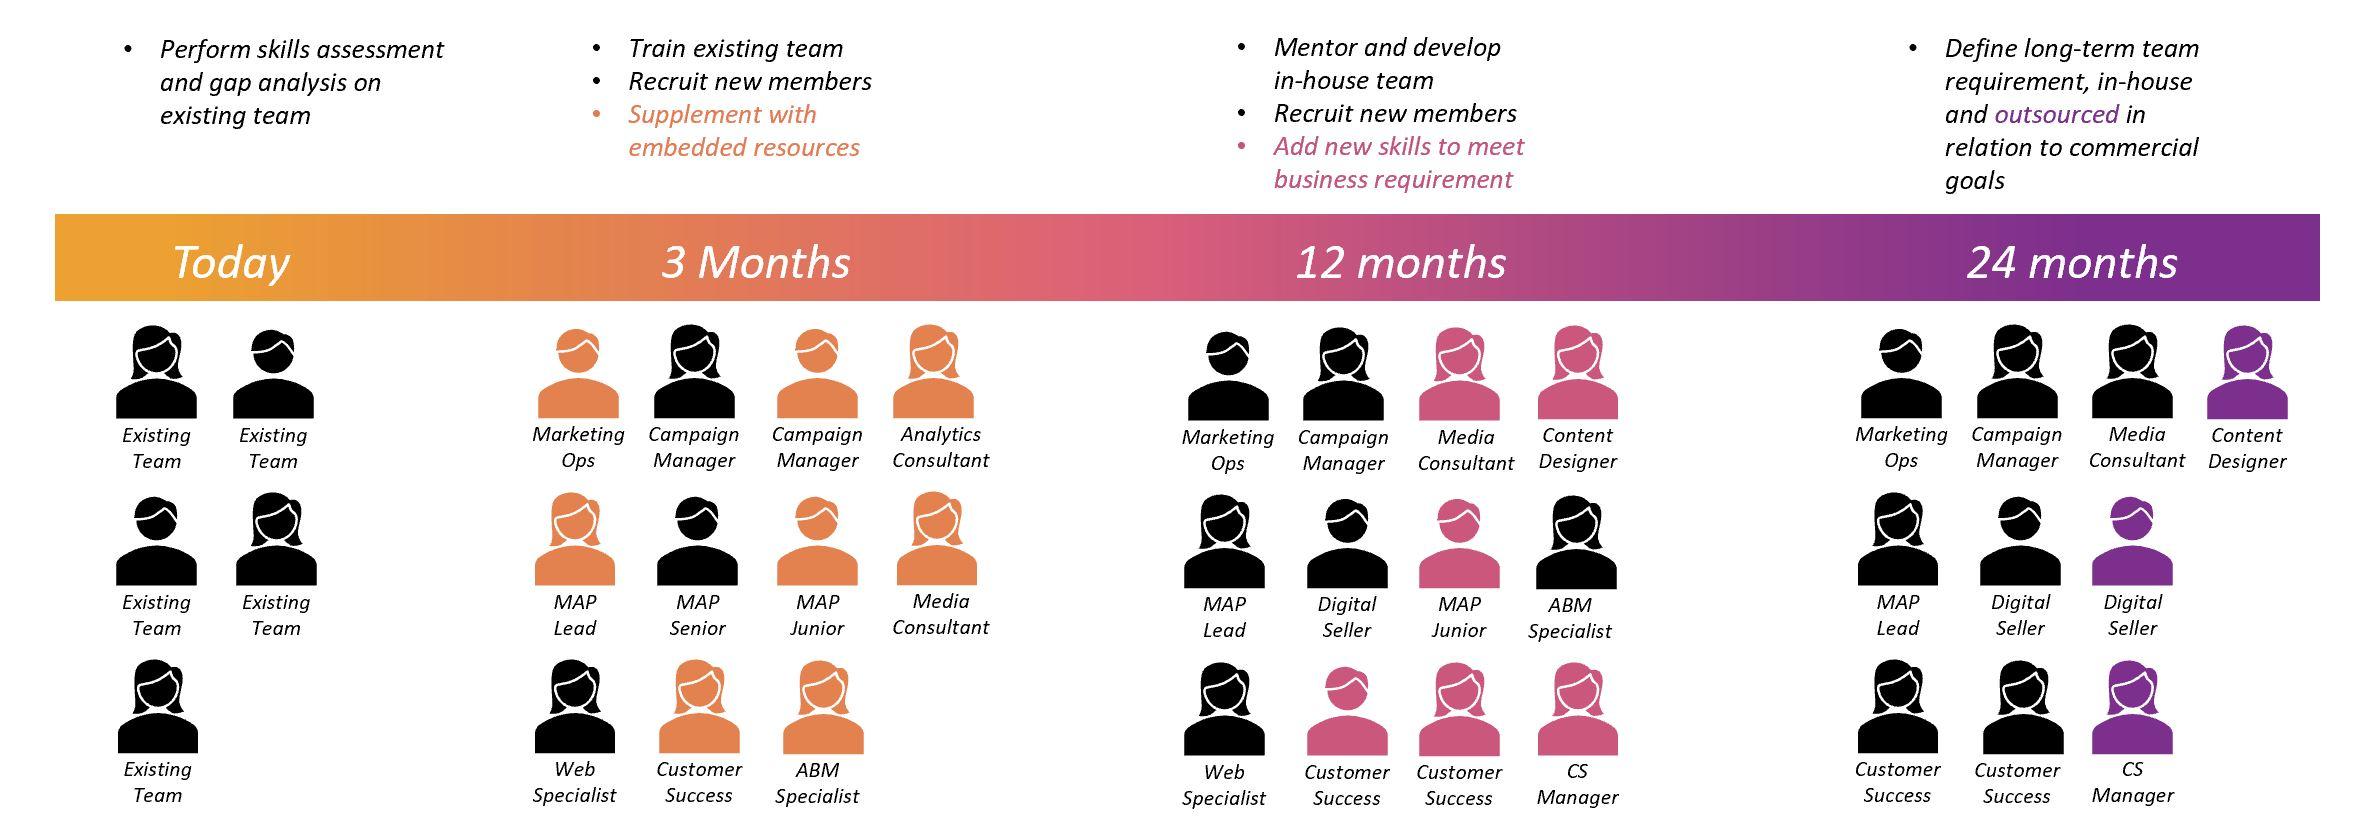 FluidTalent Staff Augmentation Example Infographic